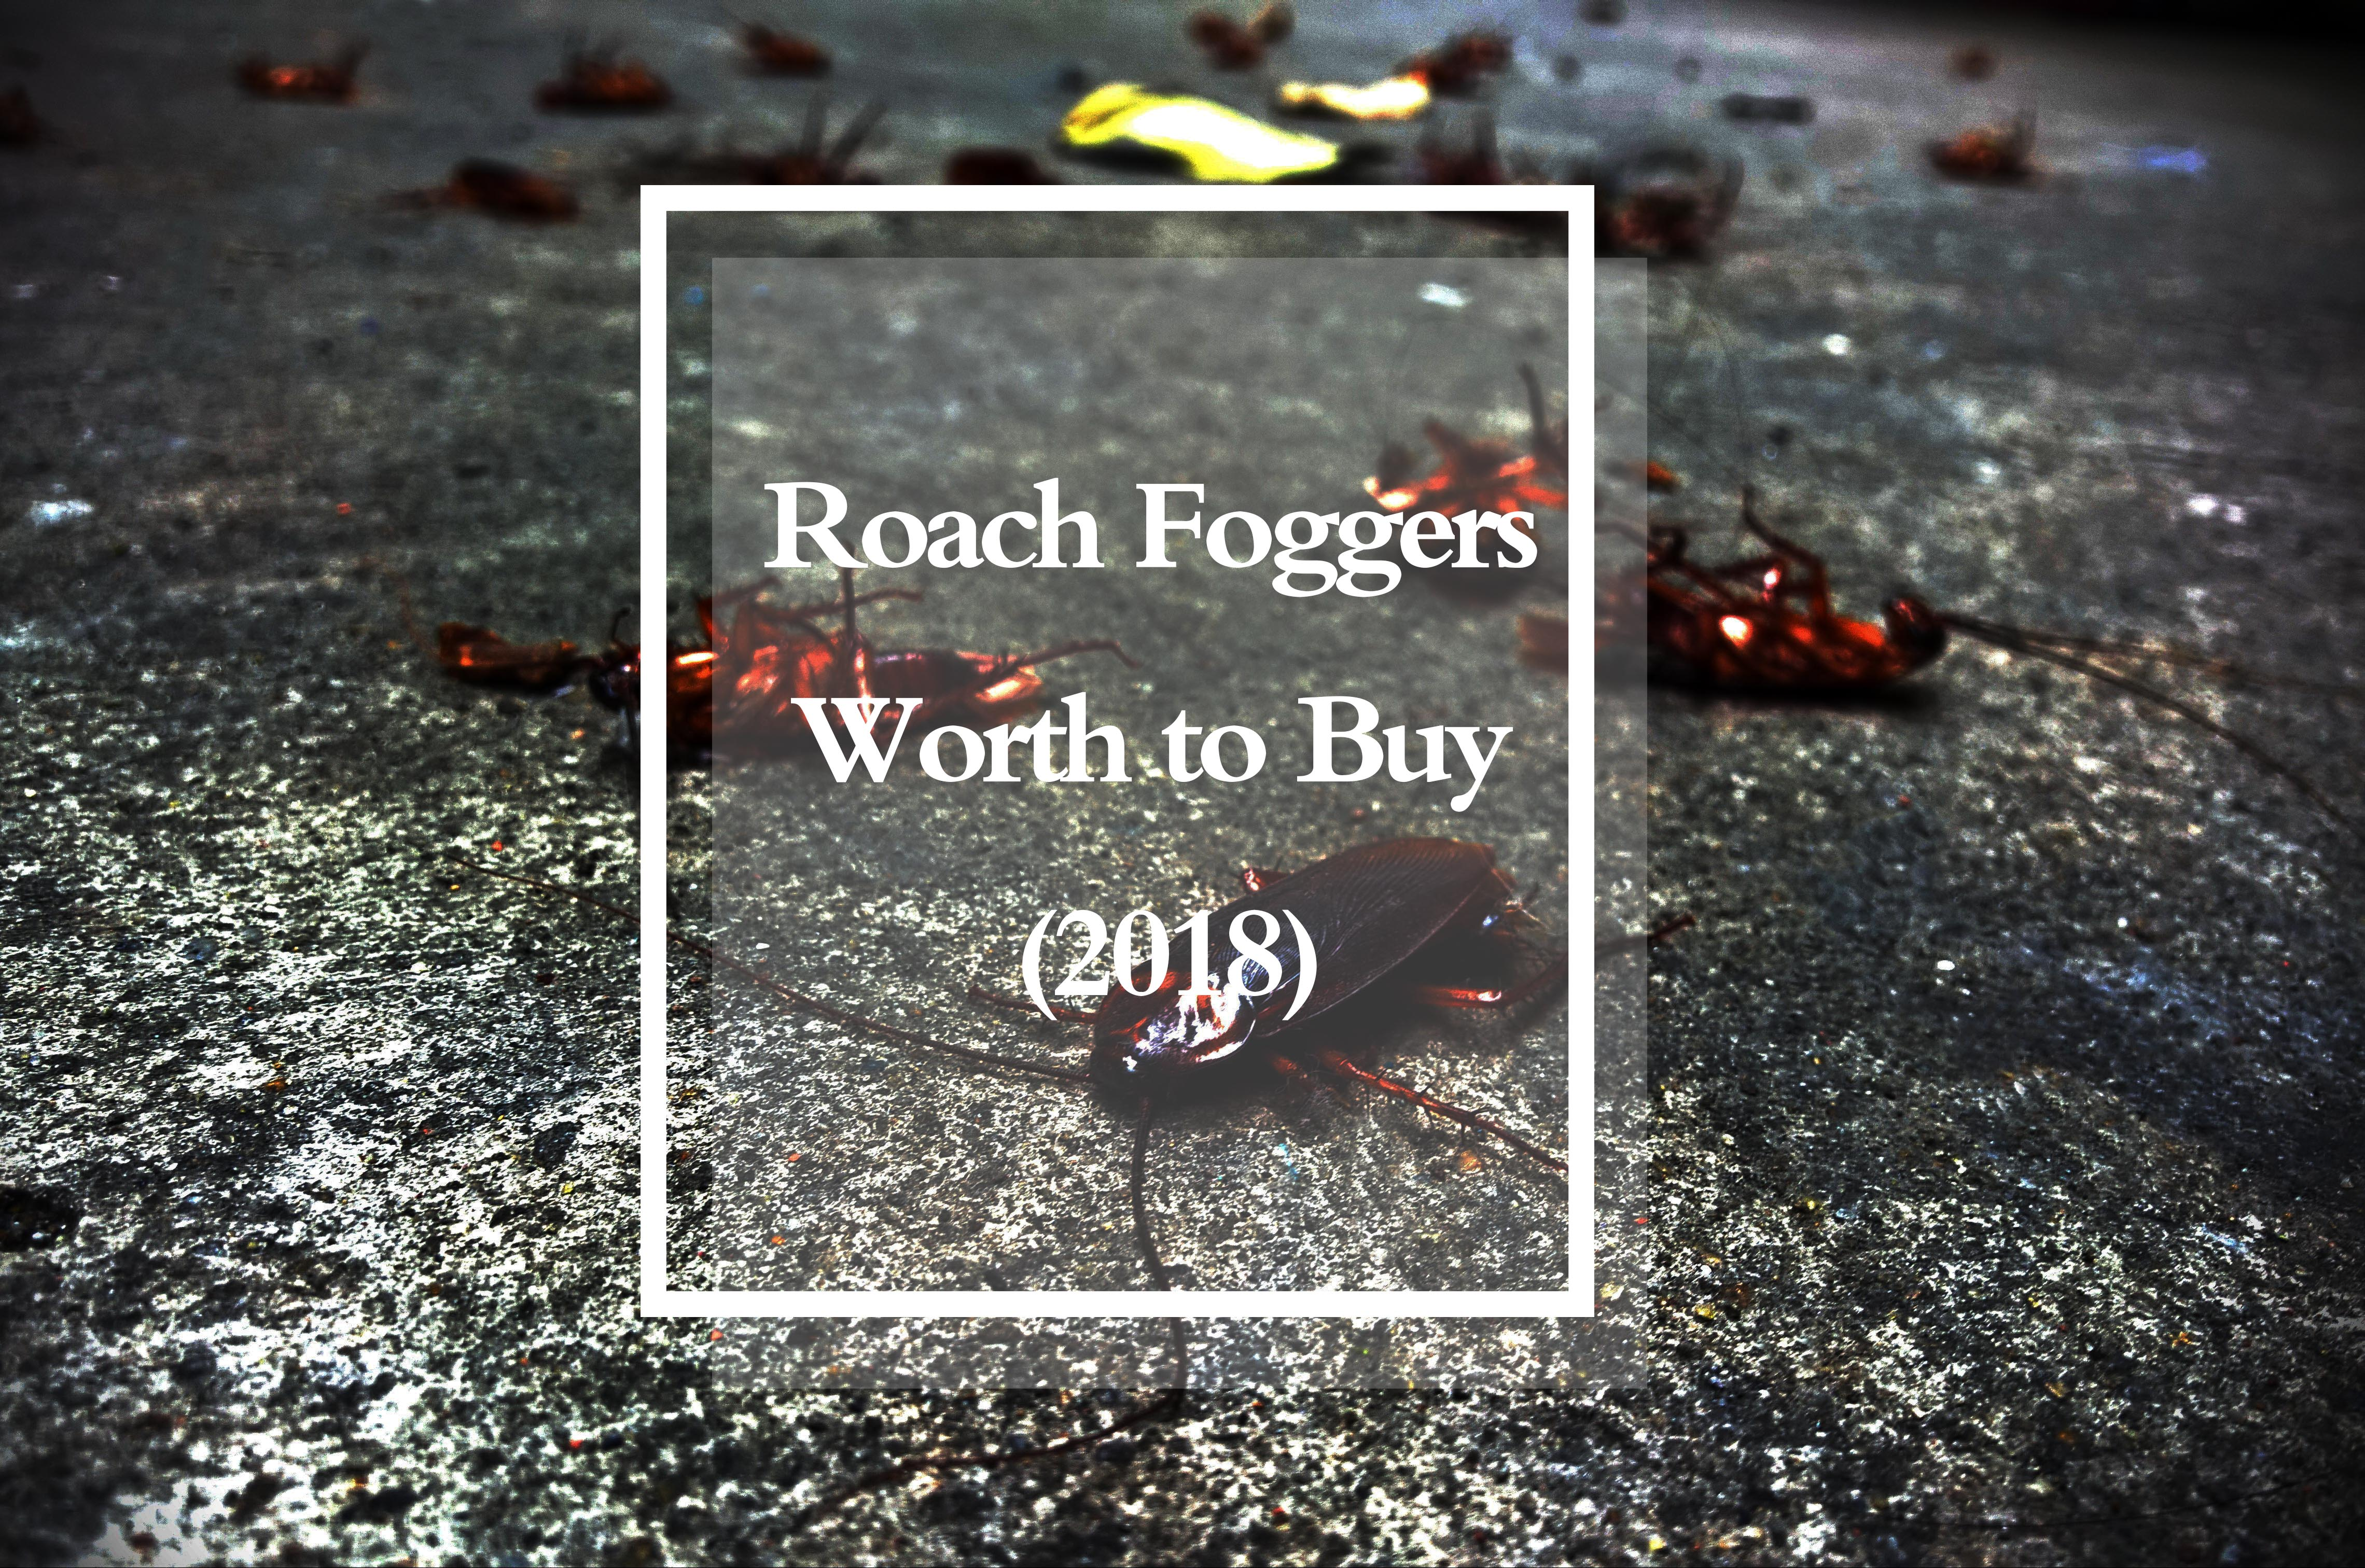 Top Roach Foggers